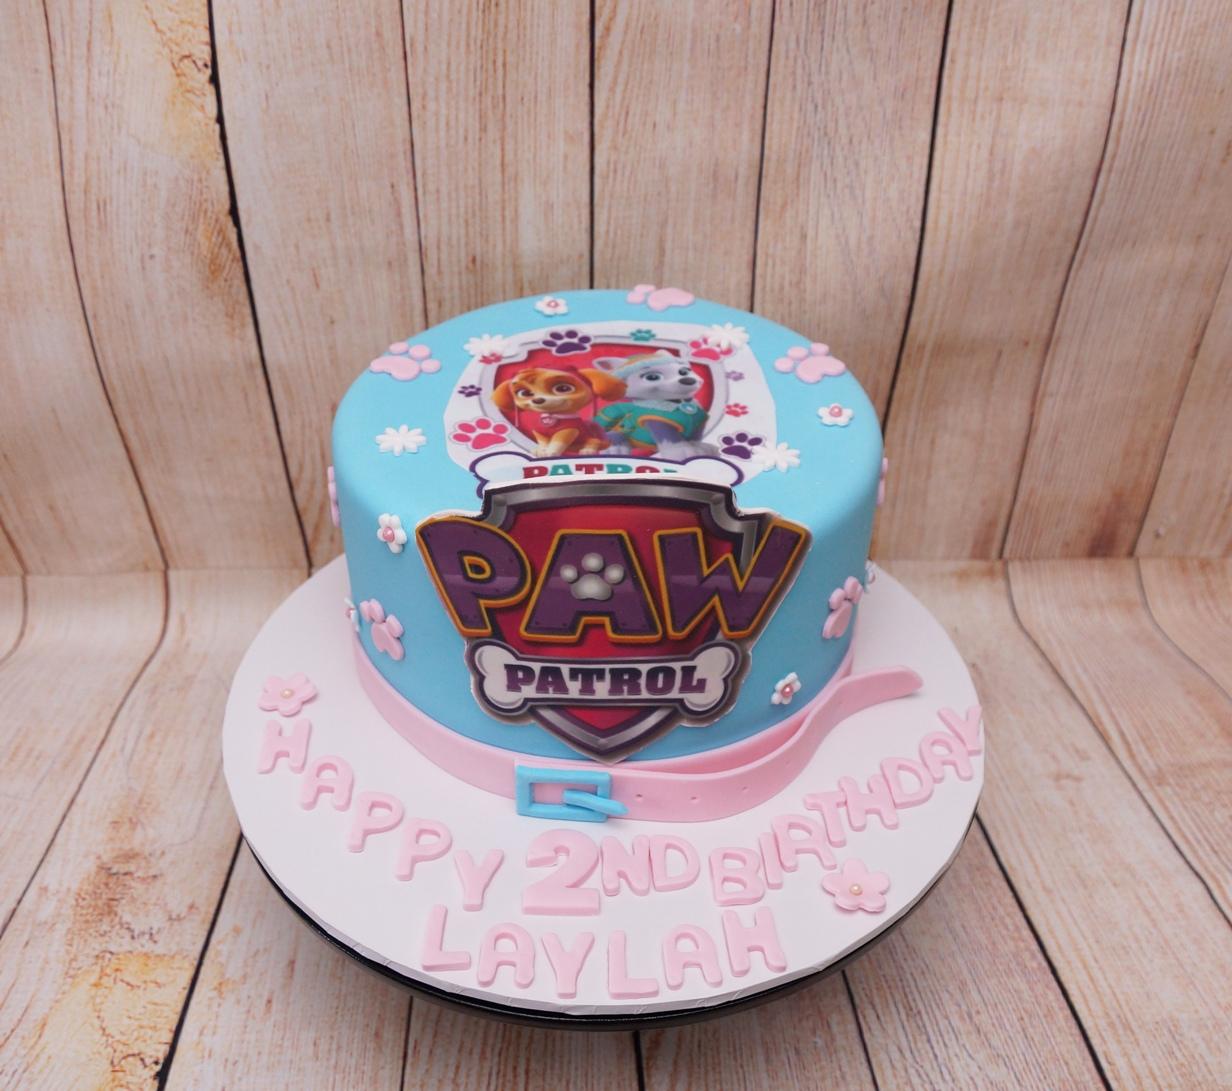 Paw Patrol Cake 8.09.18